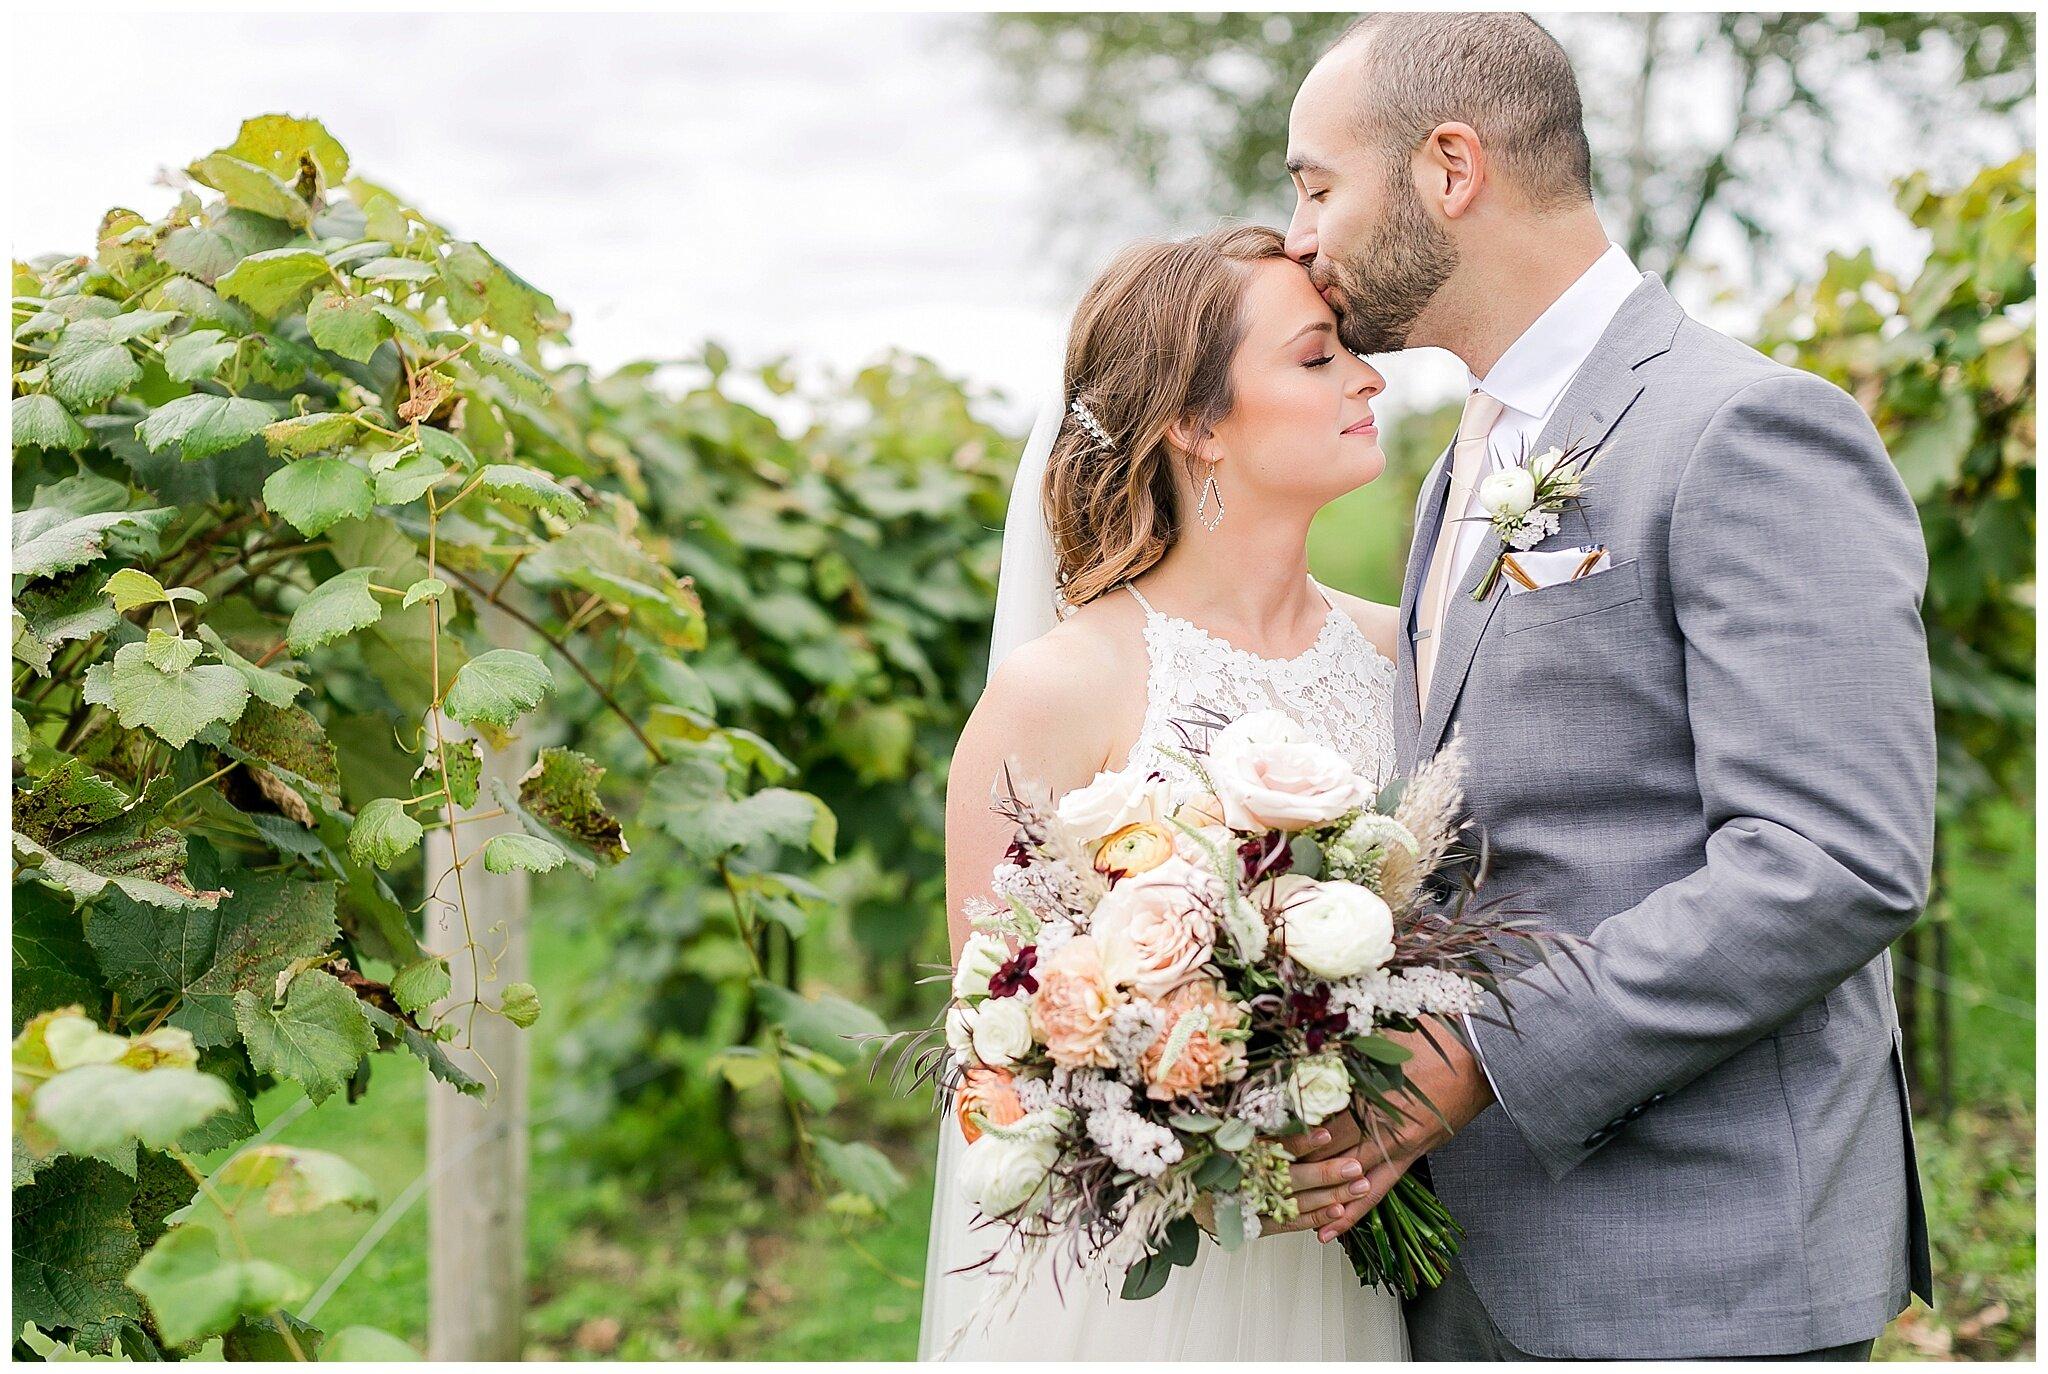 over_the_vines_edgerton_wisconsin_wedding_madison_wisconsin_photographer_0433.jpg